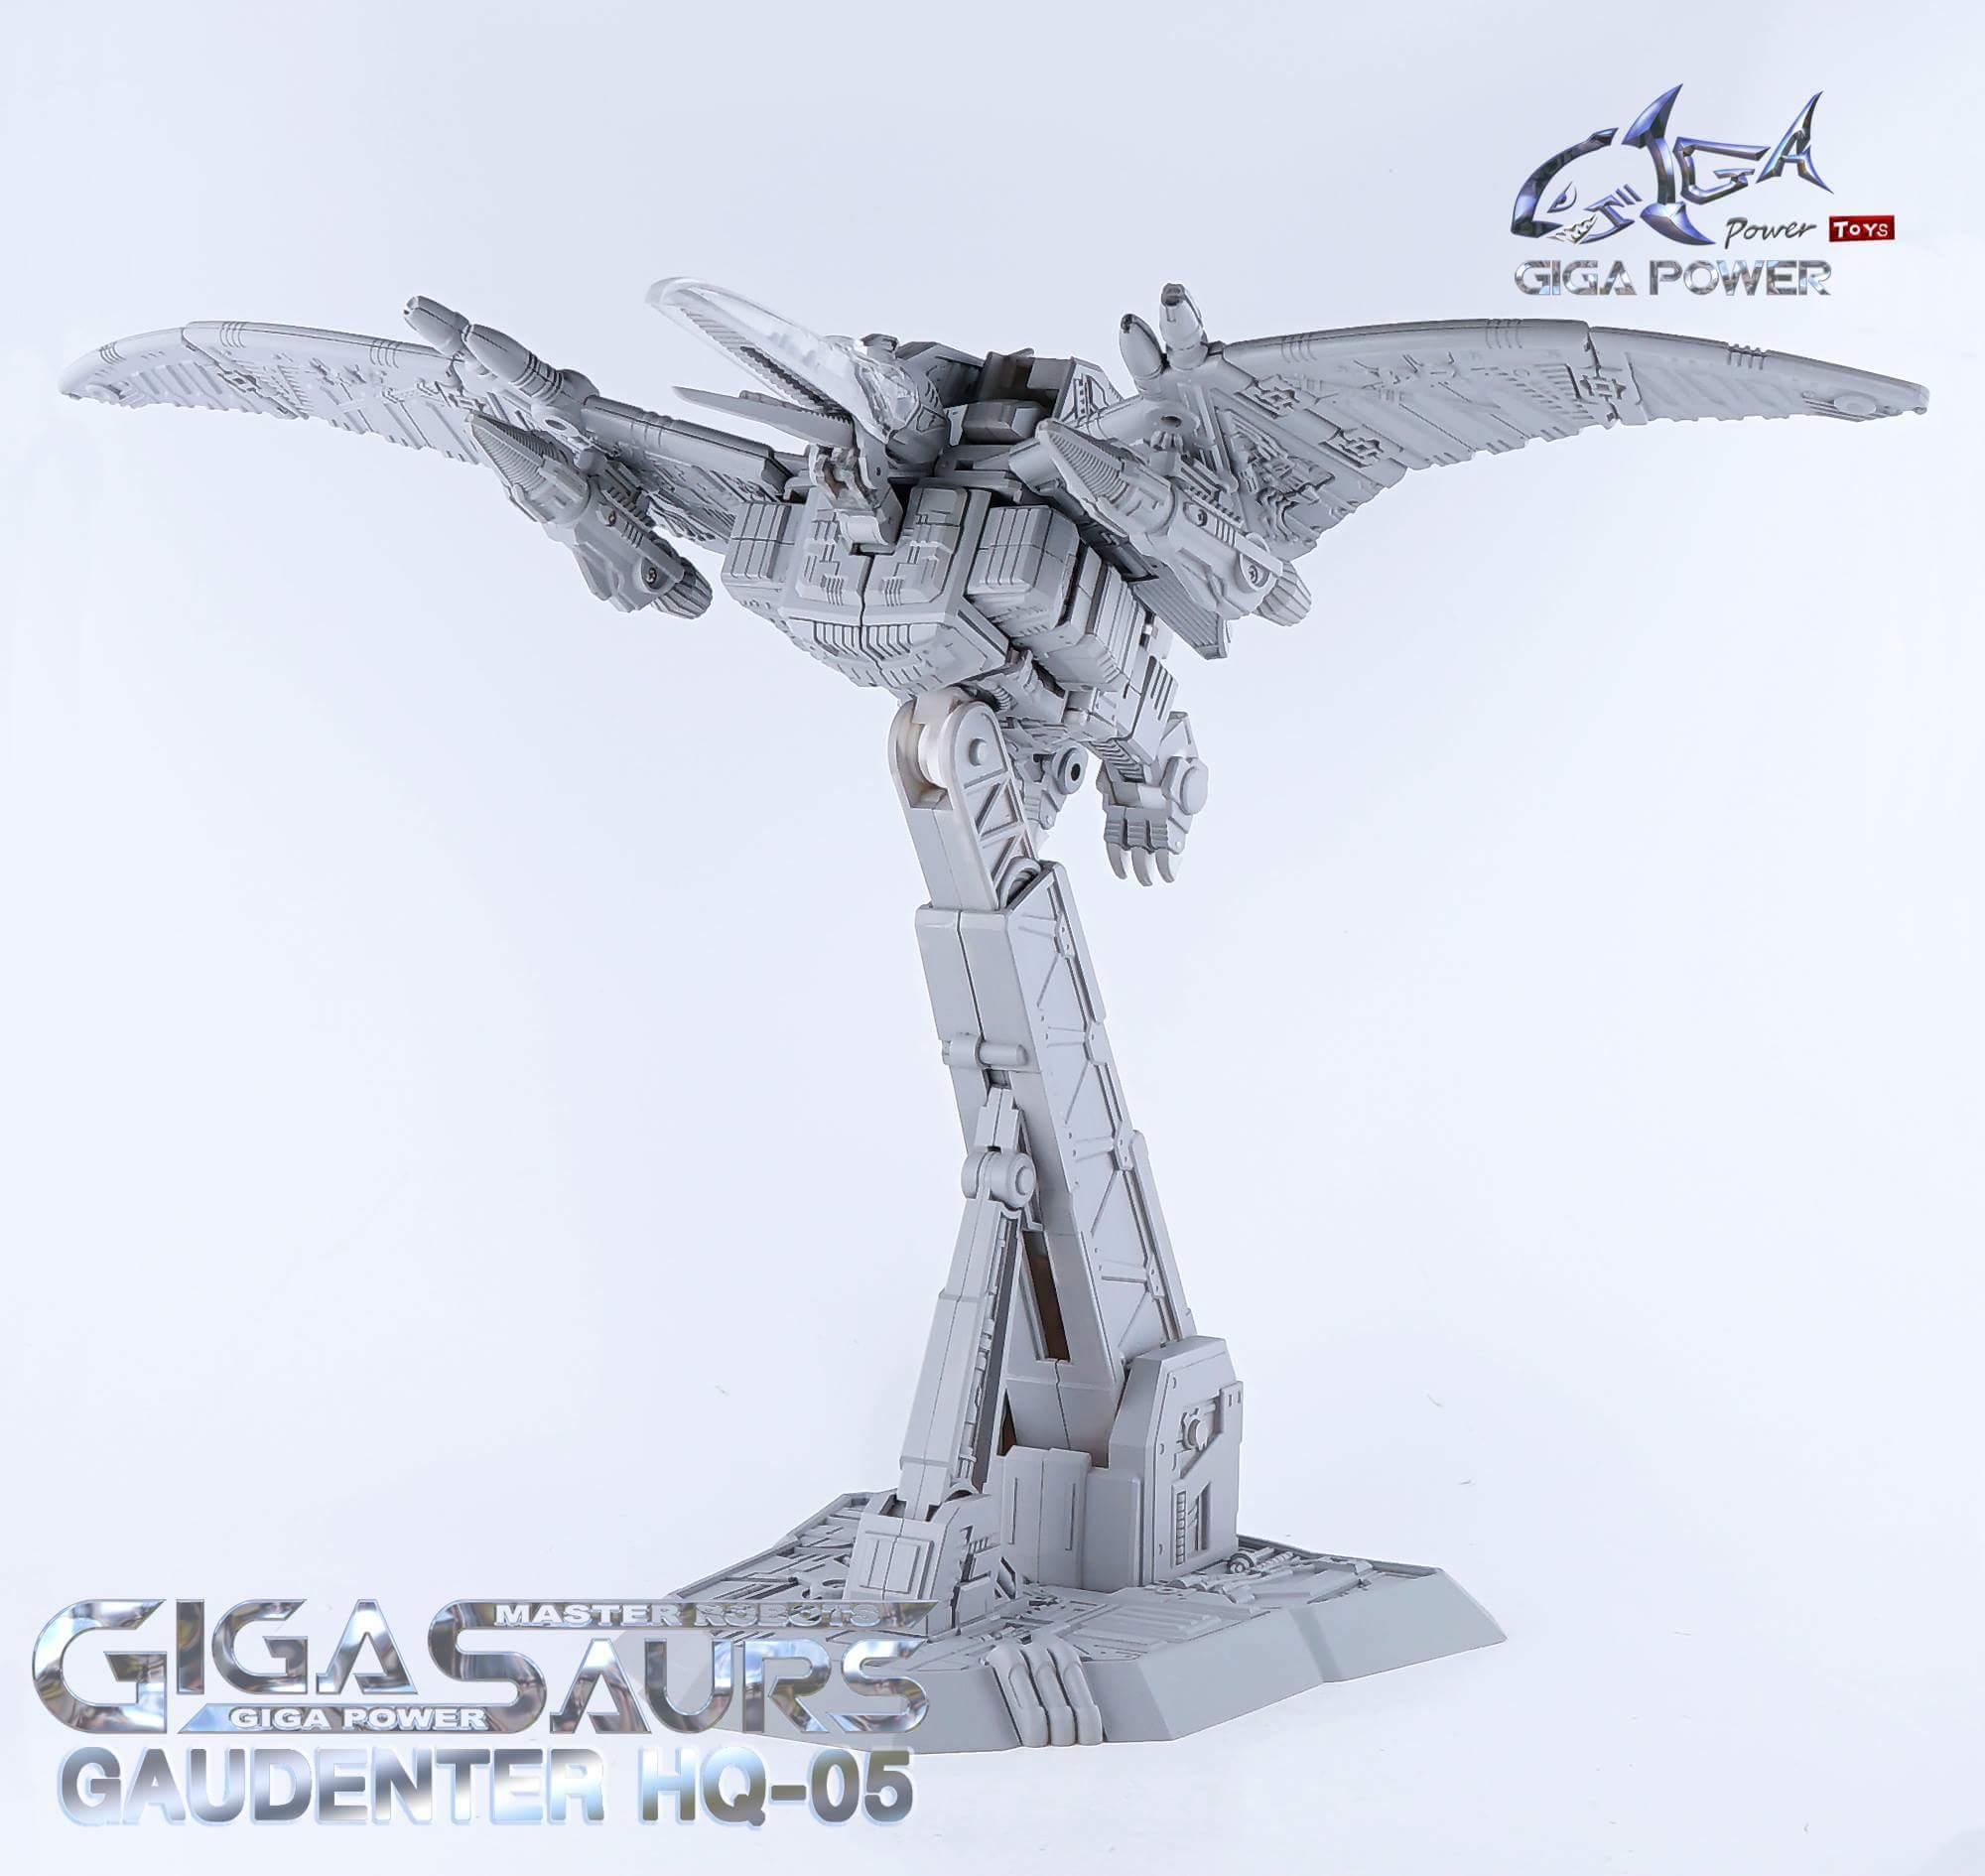 [GigaPower] Produit Tiers - Jouets HQ-01 Superator + HQ-02 Grassor + HQ-03 Guttur + HQ-04 Graviter + HQ-05 Gaudenter - aka Dinobots - Page 4 AVvYqSNu